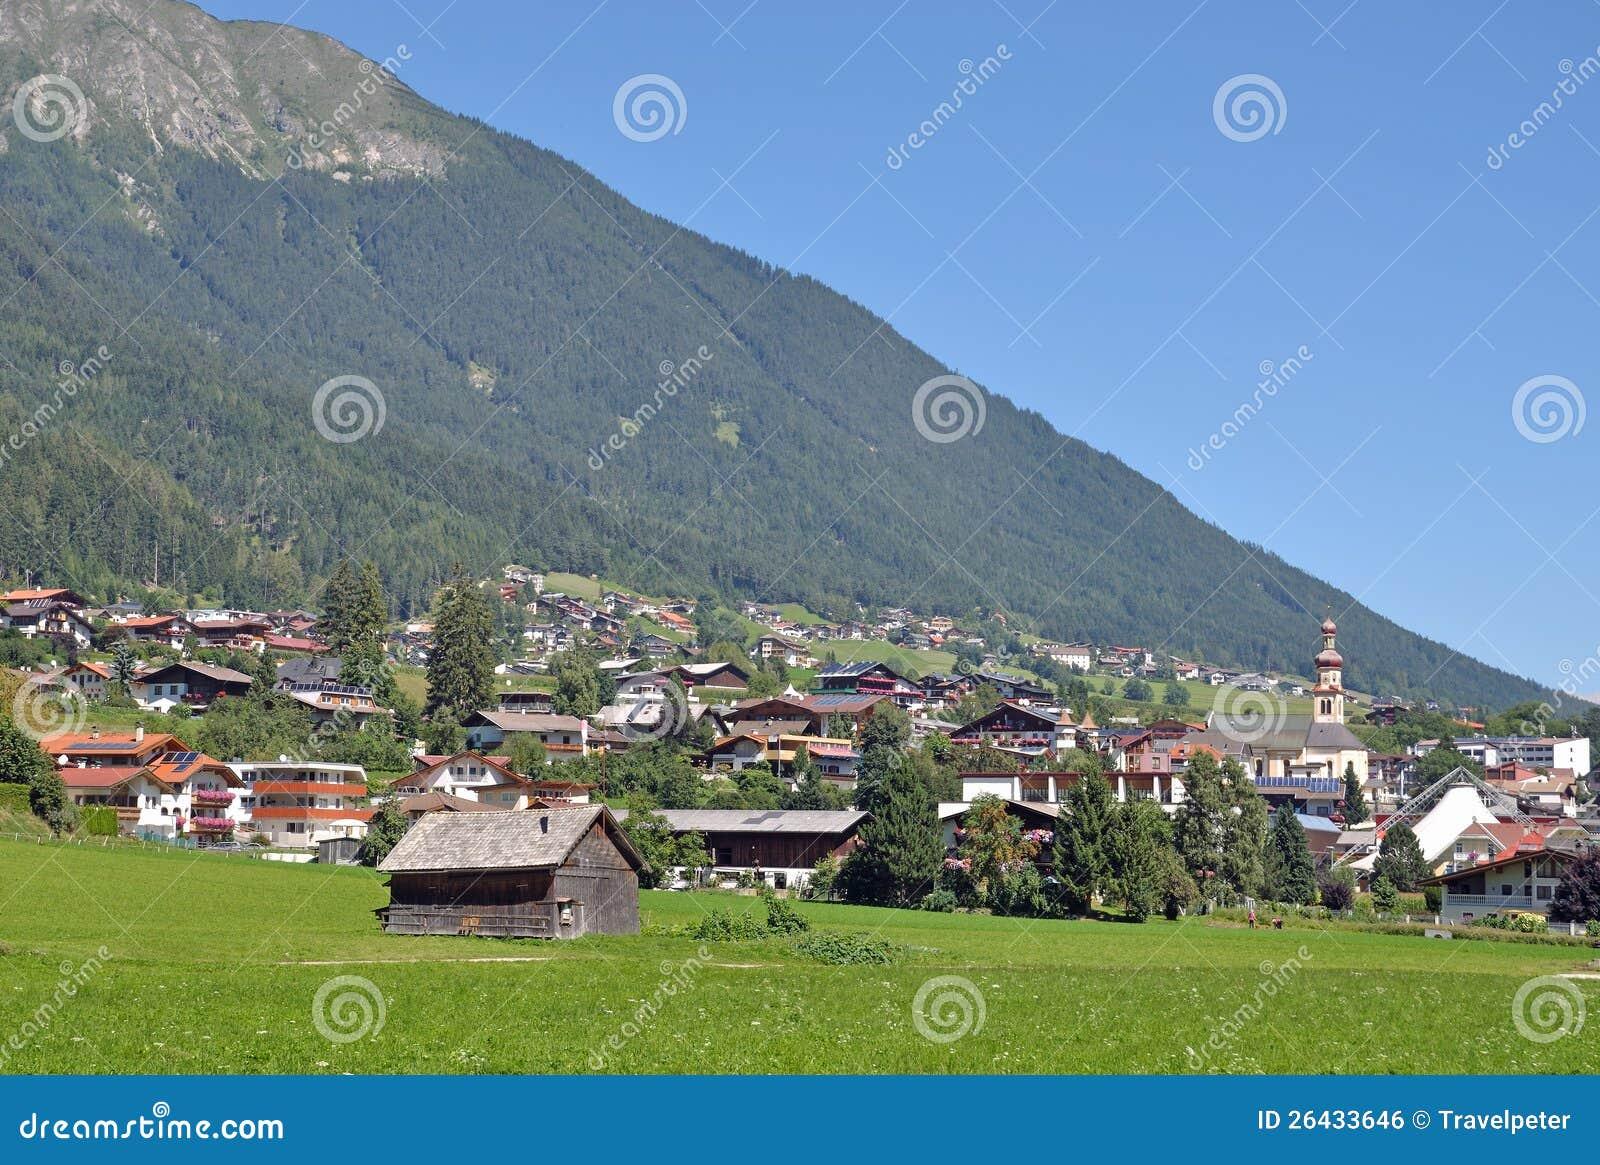 Fulpmes,Stubaital,Tirol,Austria Royalty Free Stock Image Image ...